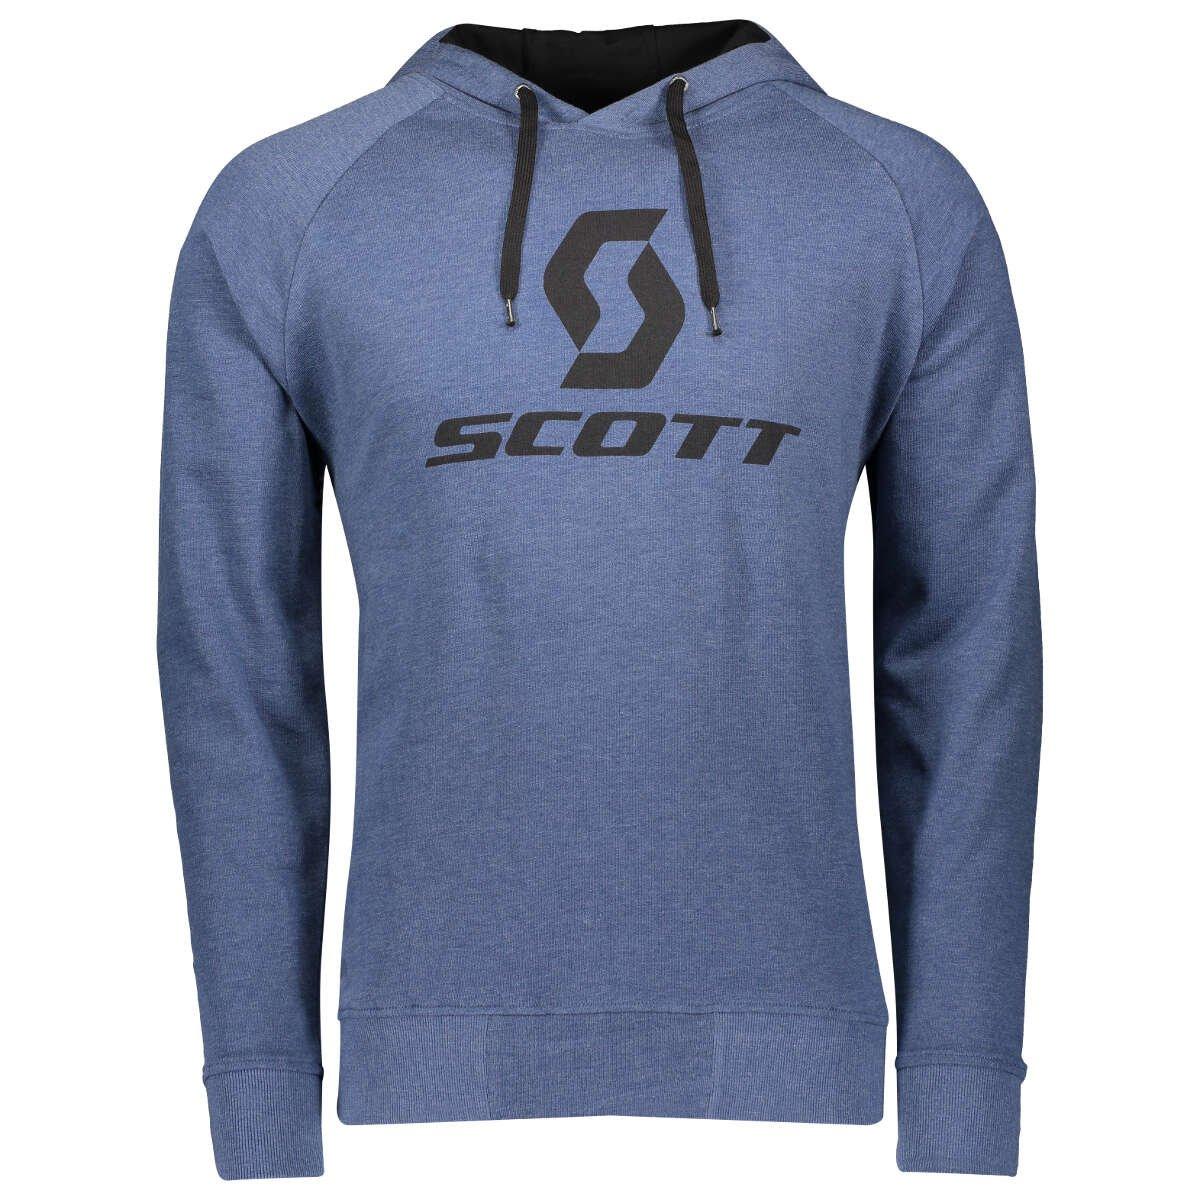 Scott Hoody 10 Icon Blau Gr. M